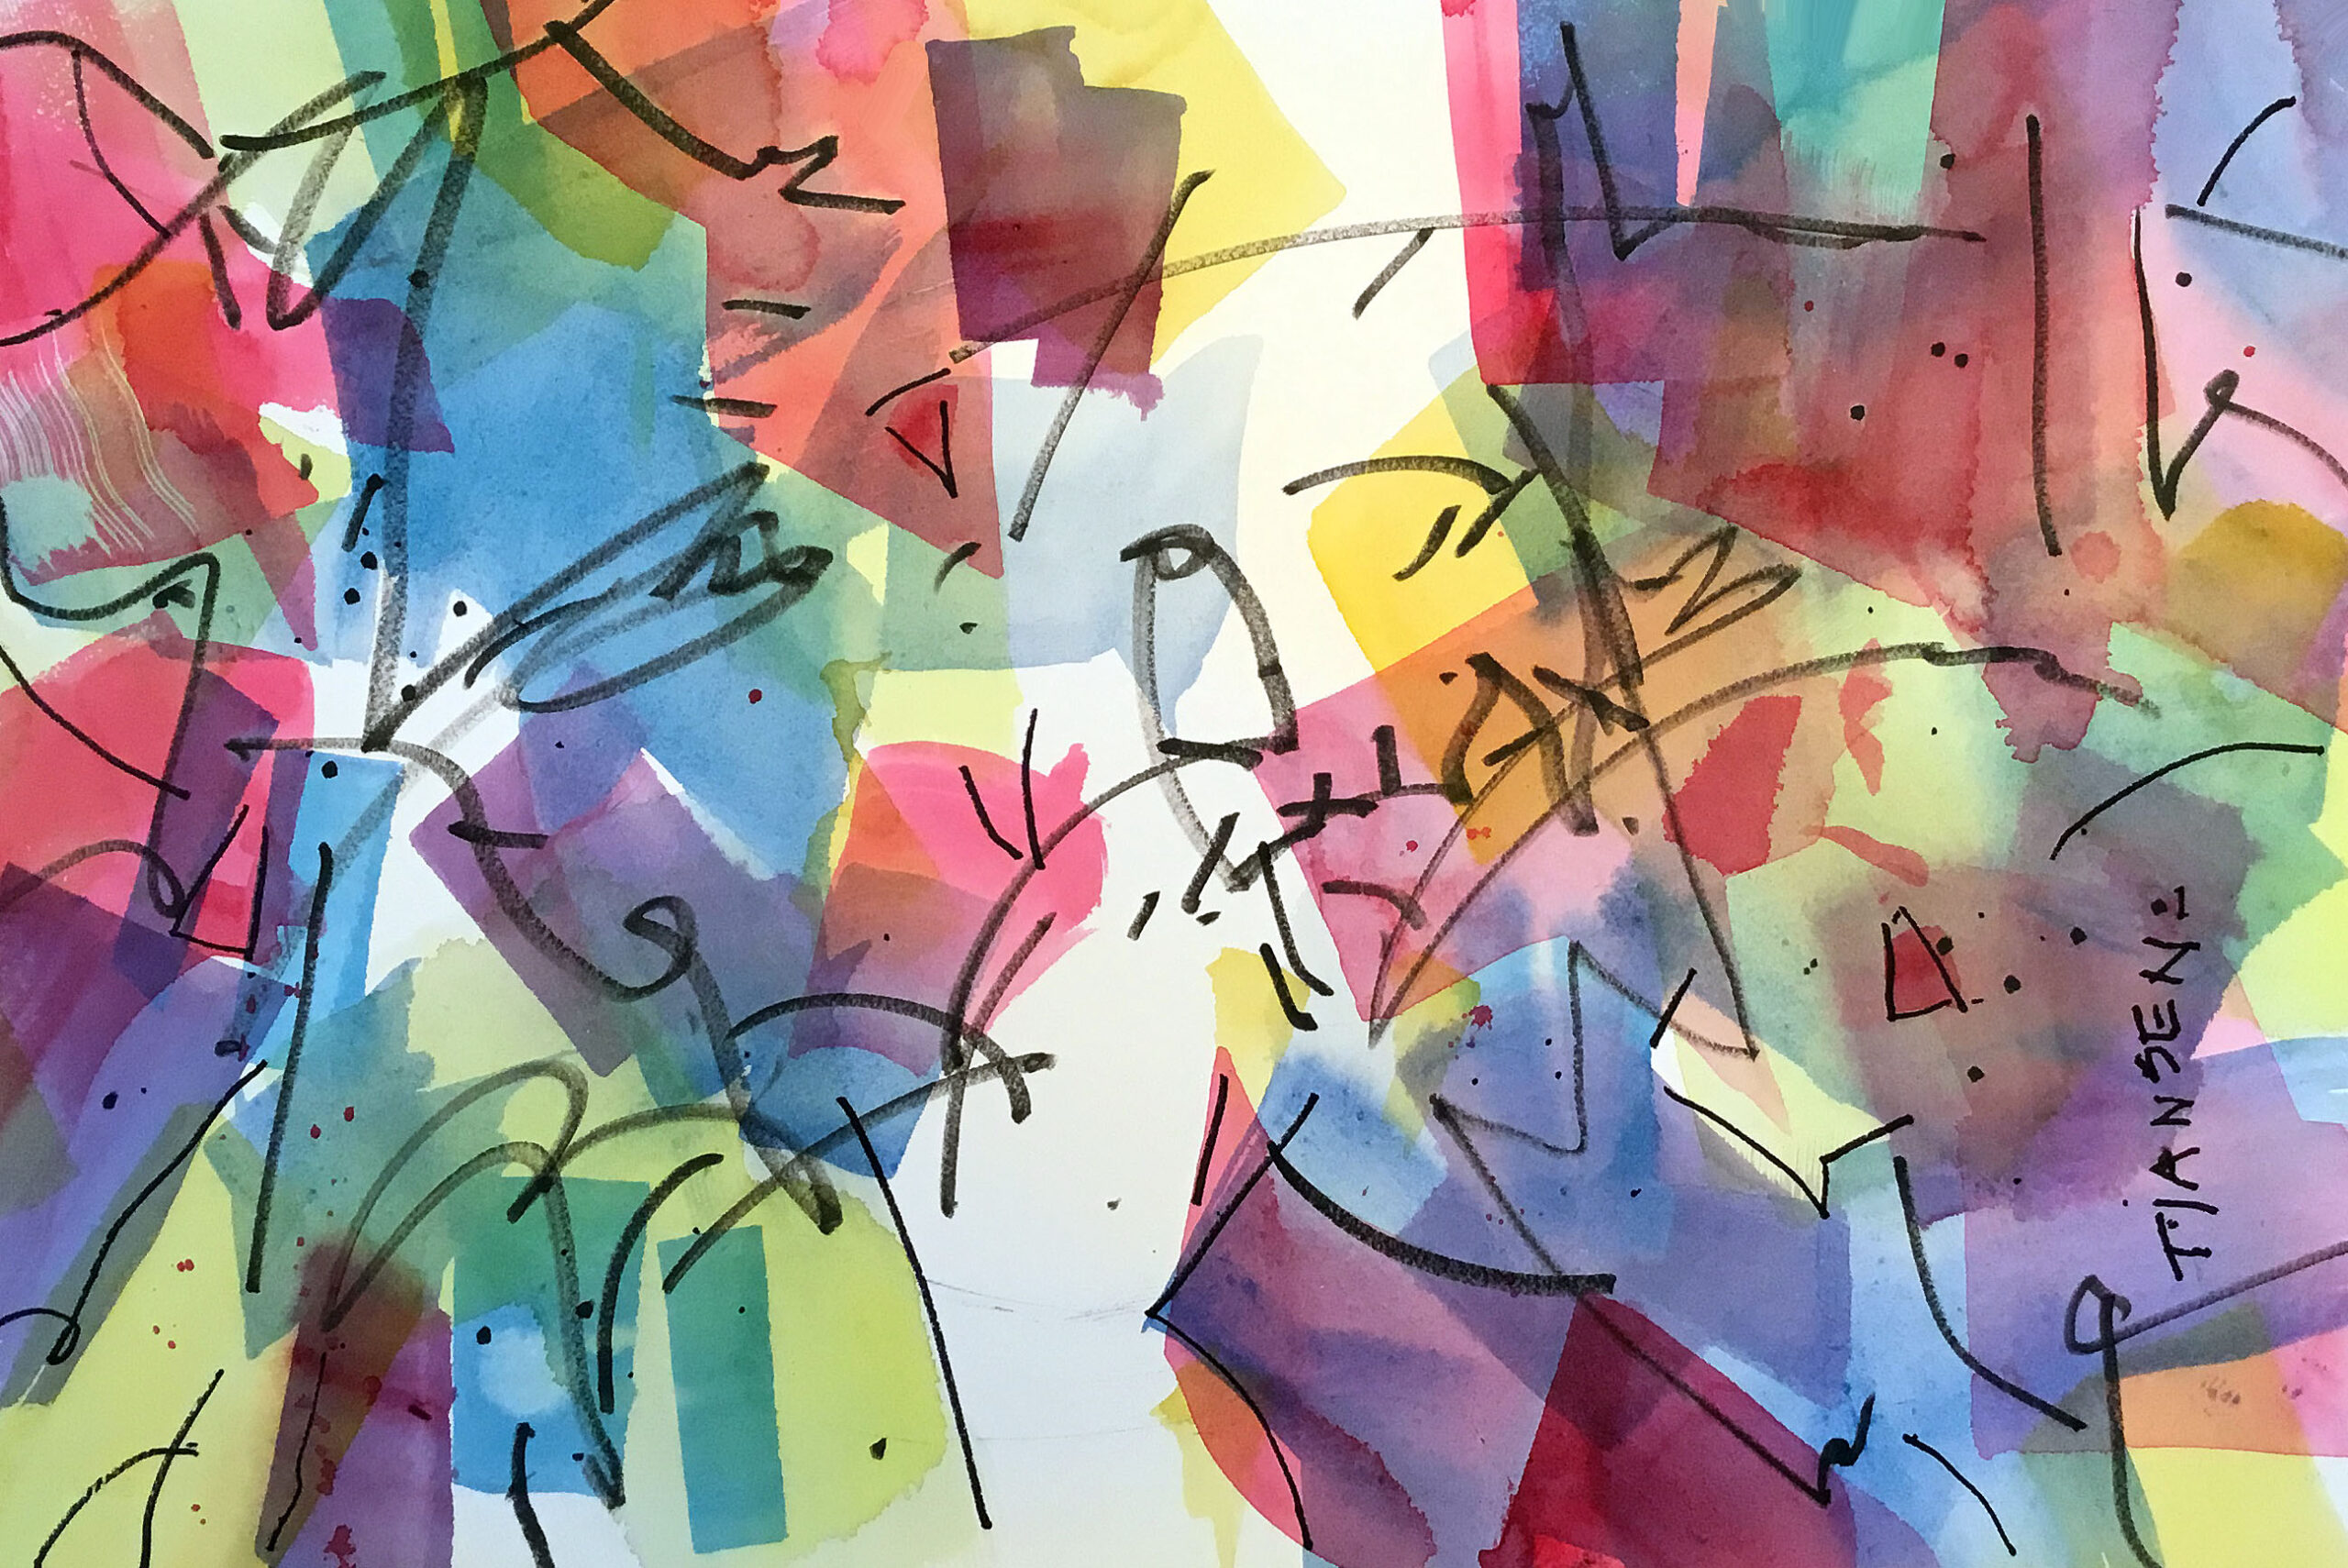 Woody Hansen Watercolor, 15x22, Manipulated Freedom, 15x22